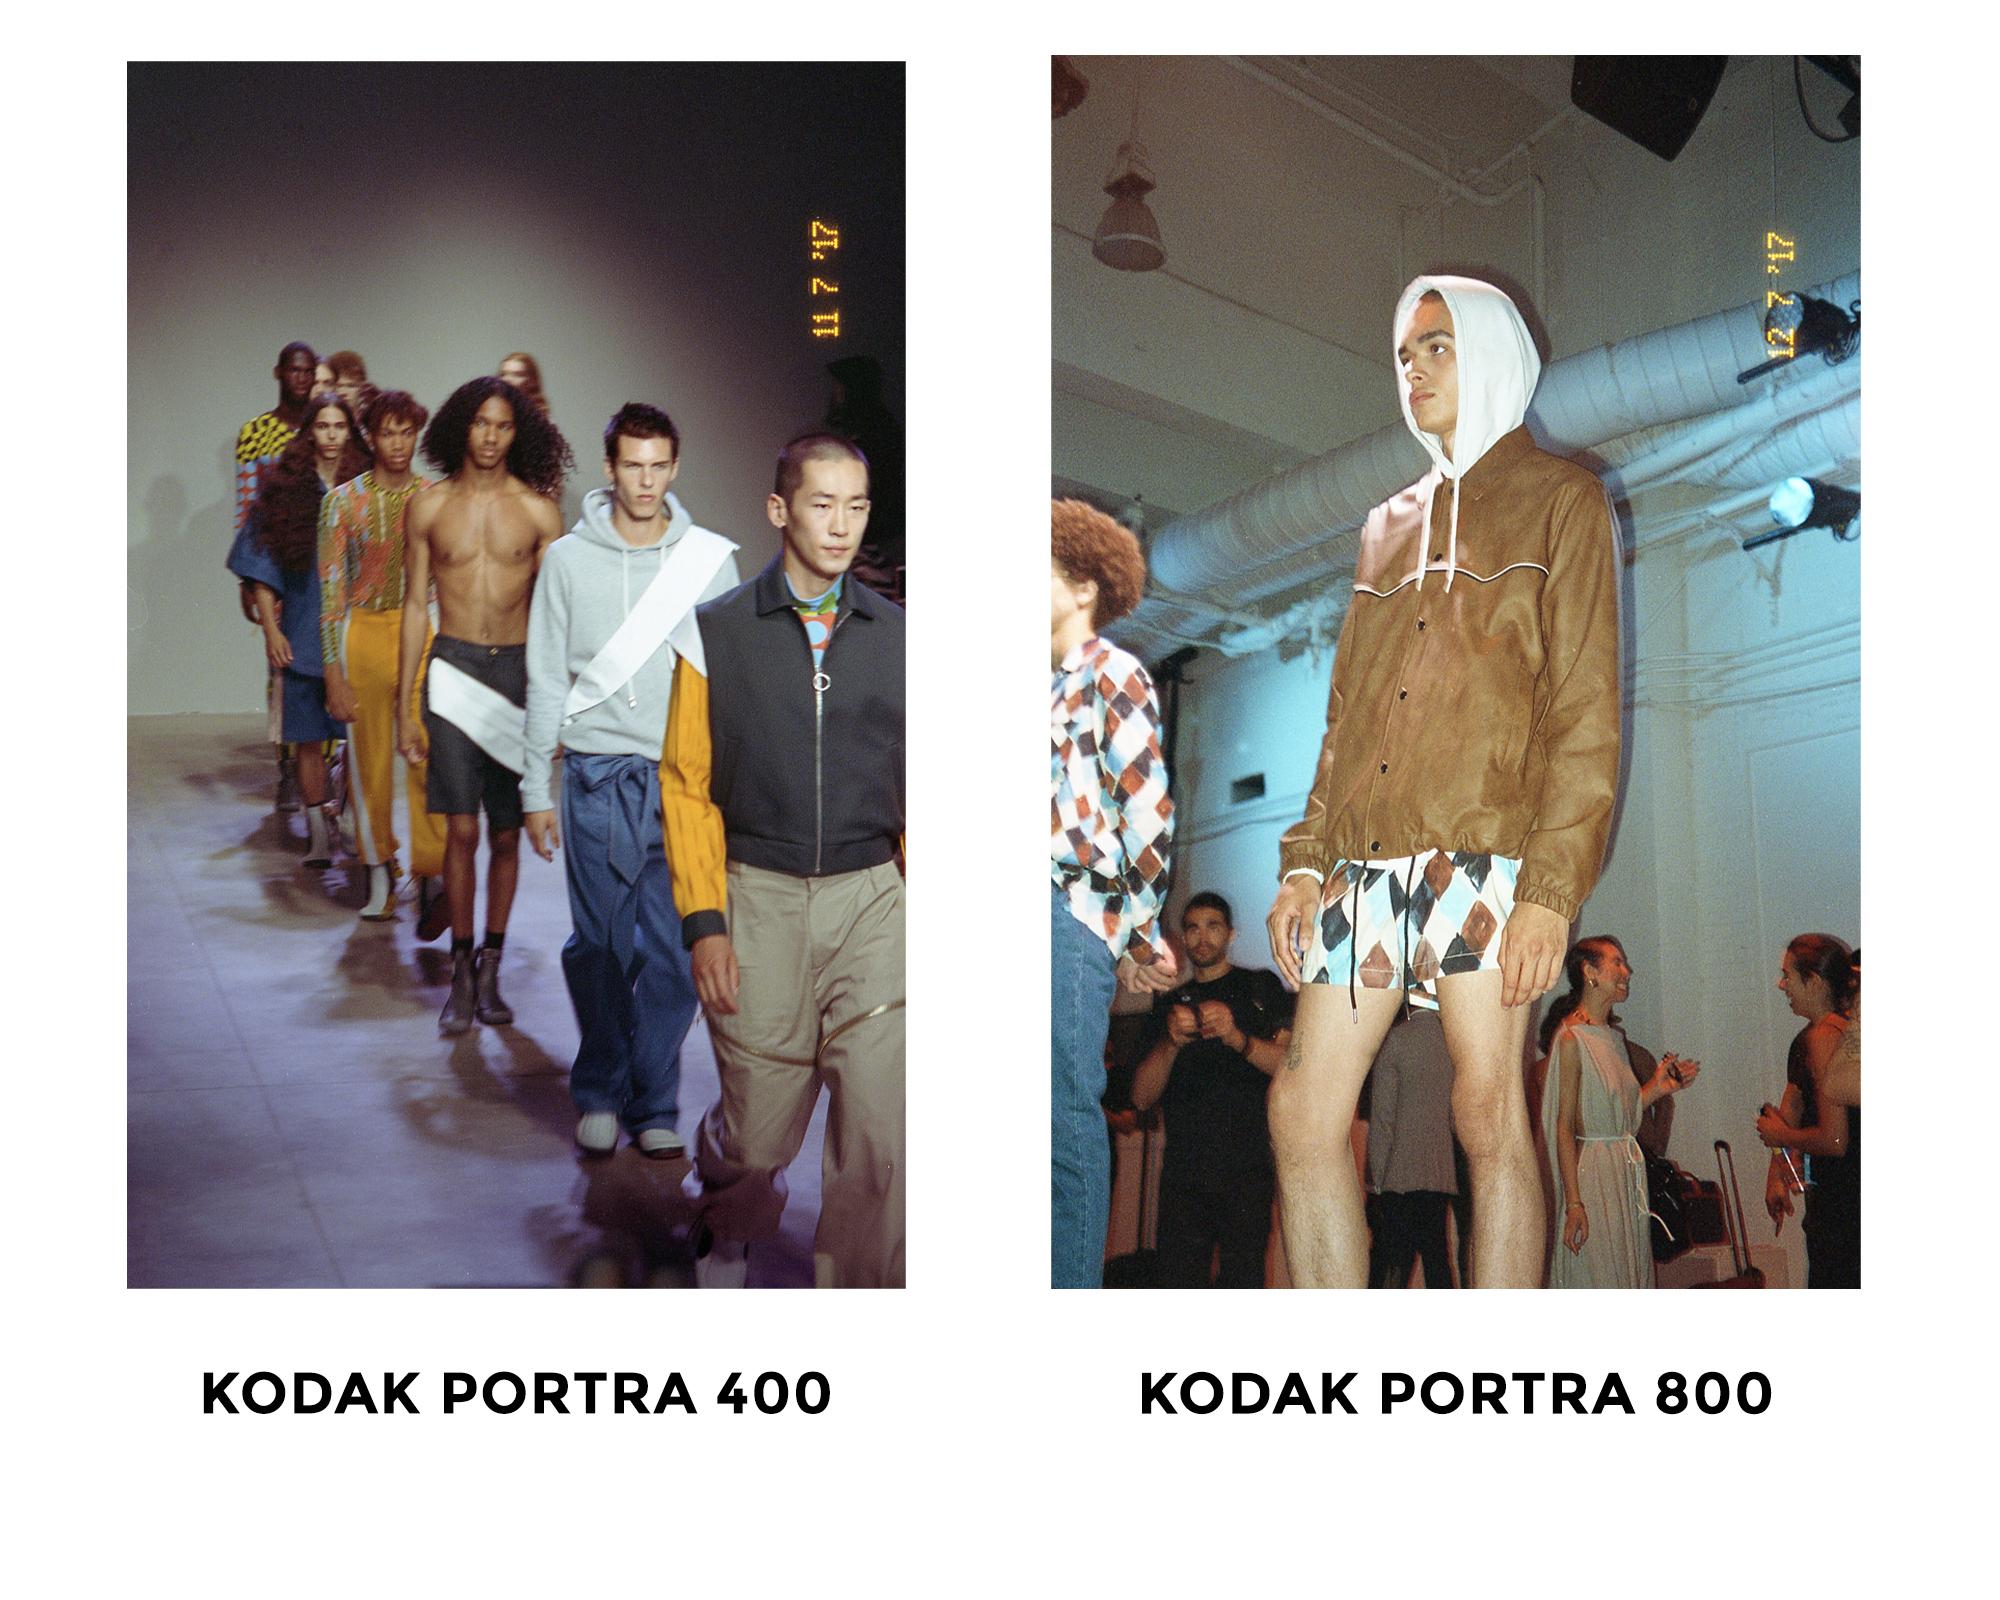 2 - Kodak Portra 400 vs. Kodak PortrA 800 - FILTERGRADE BLOG